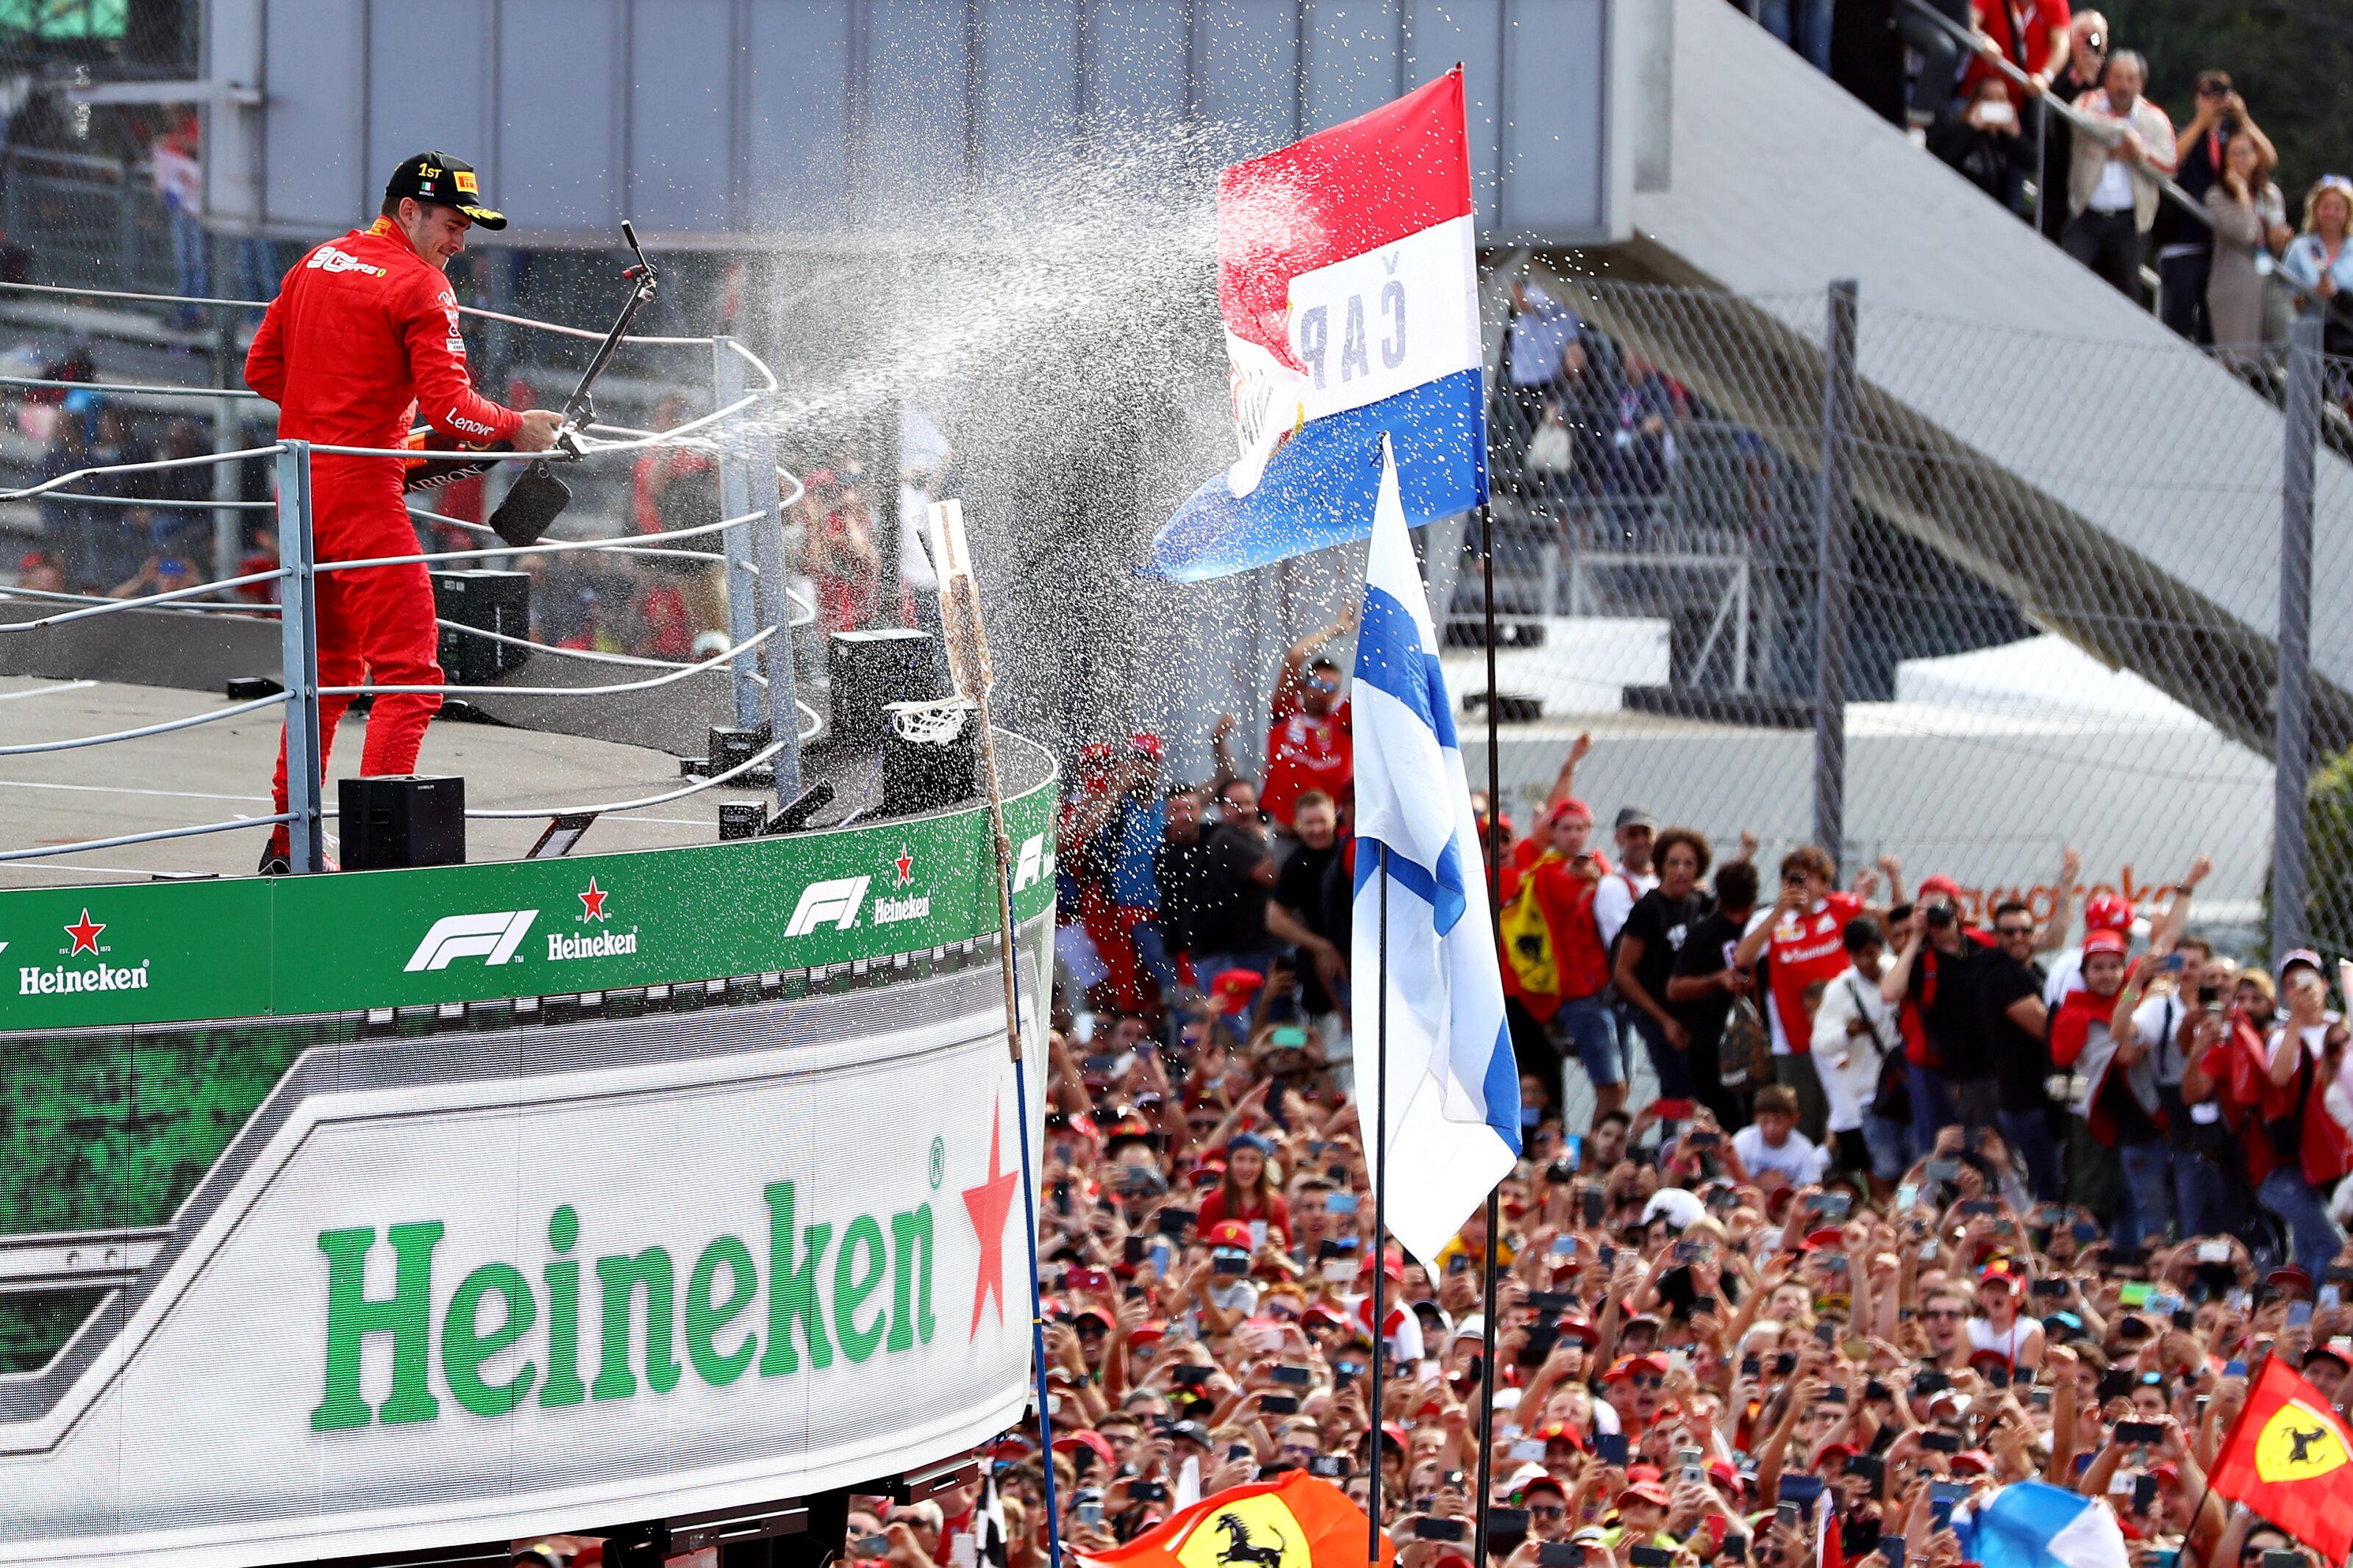 Formula 1: Charles Leclerc wins 2019 Italian Grand Prix